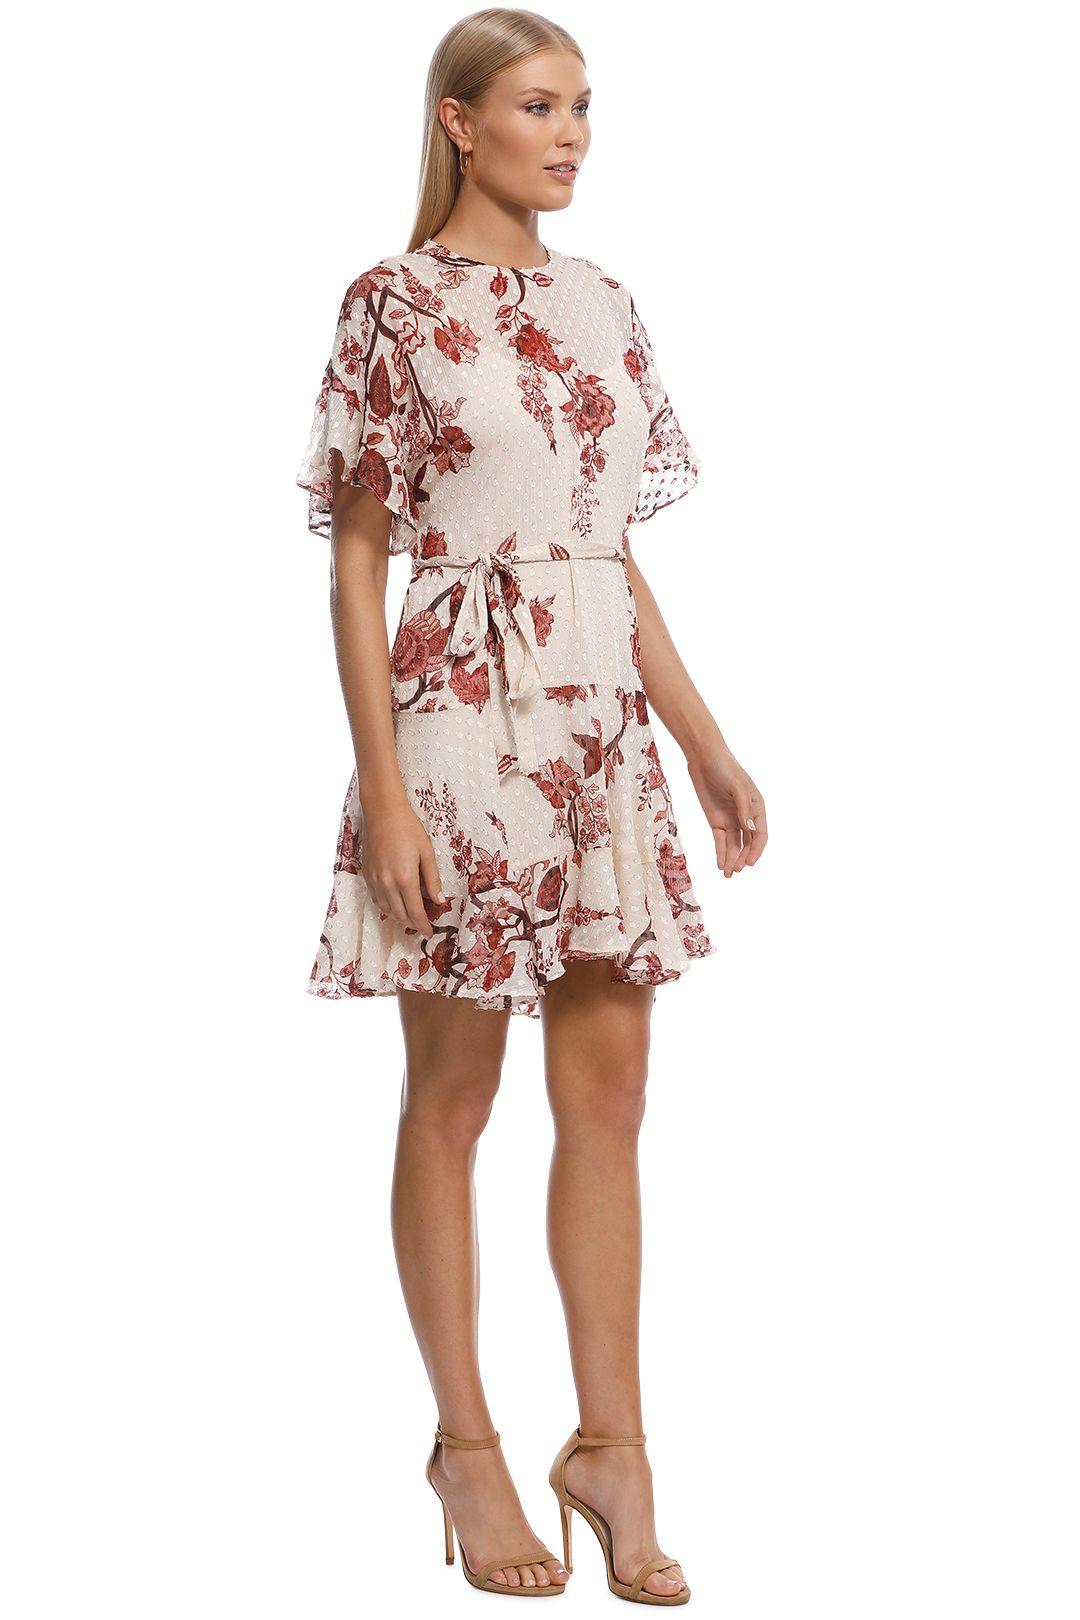 Rodeo Show - Carmel Mini Dress - Brown - Side